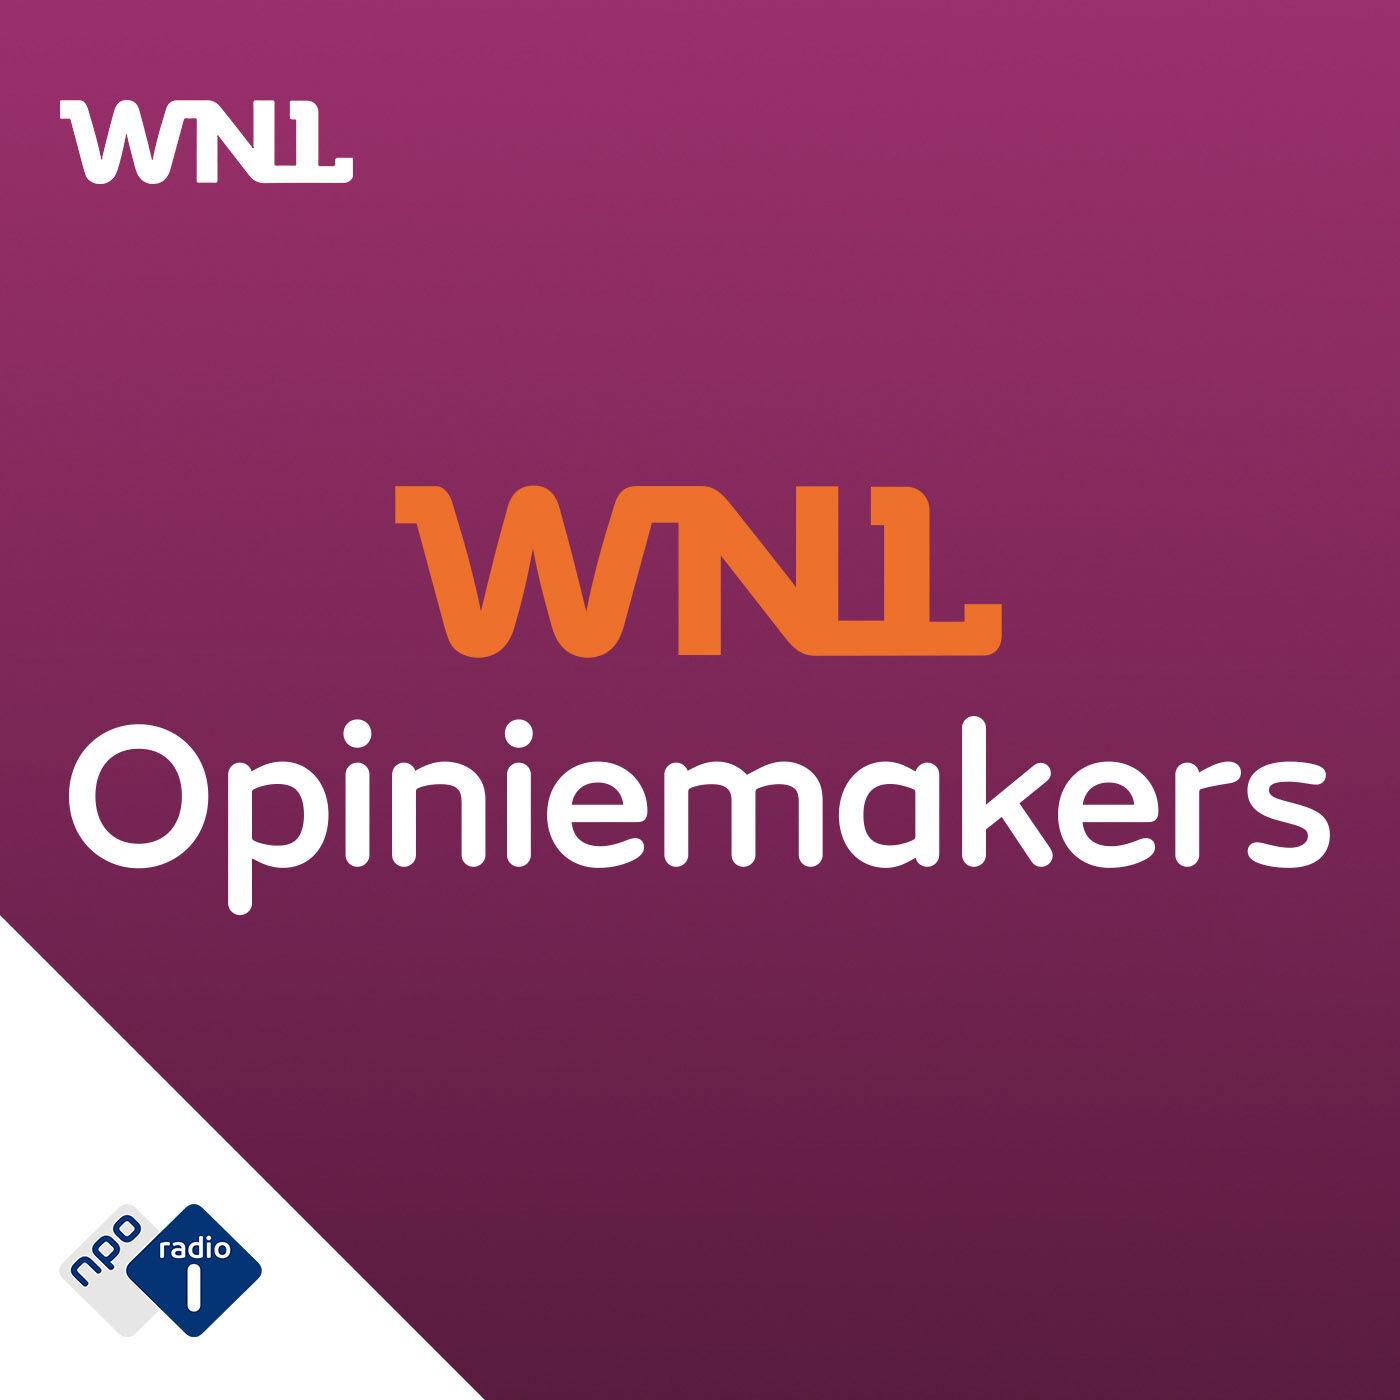 WNL Opiniemakers logo